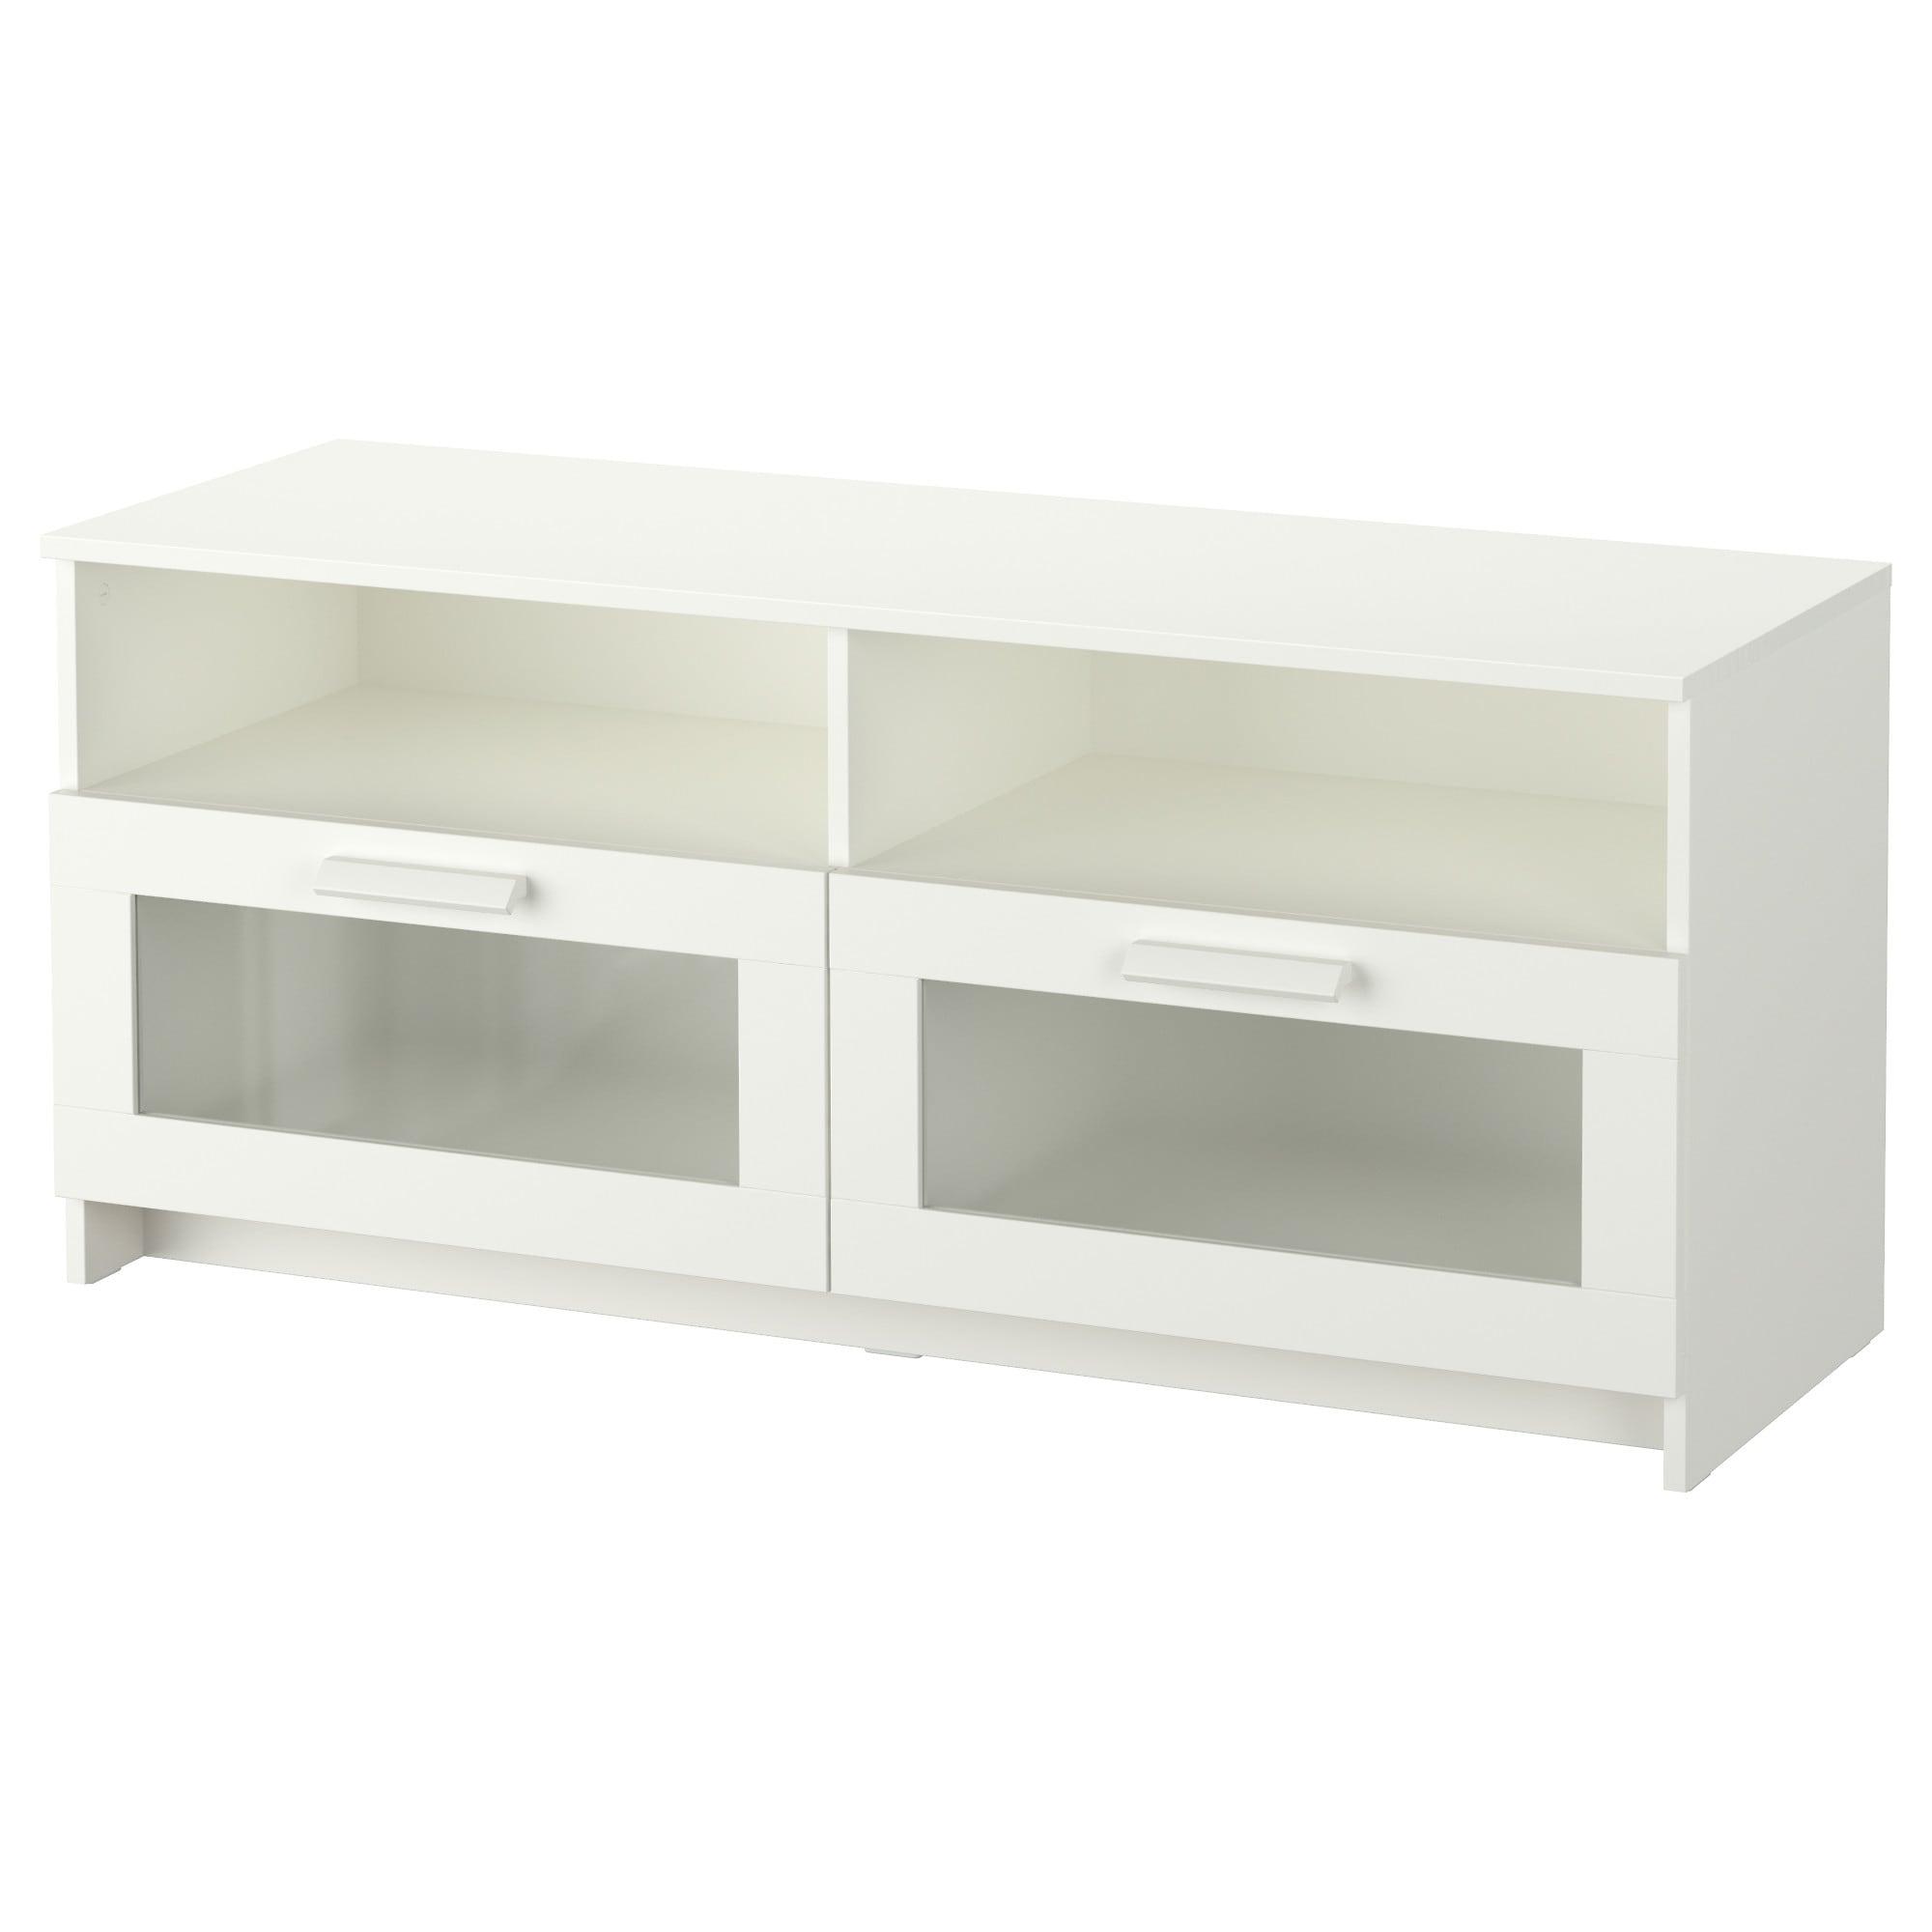 Ikea Brimnes Black Tv Unit Tv Bench Brimnes Tv Storage